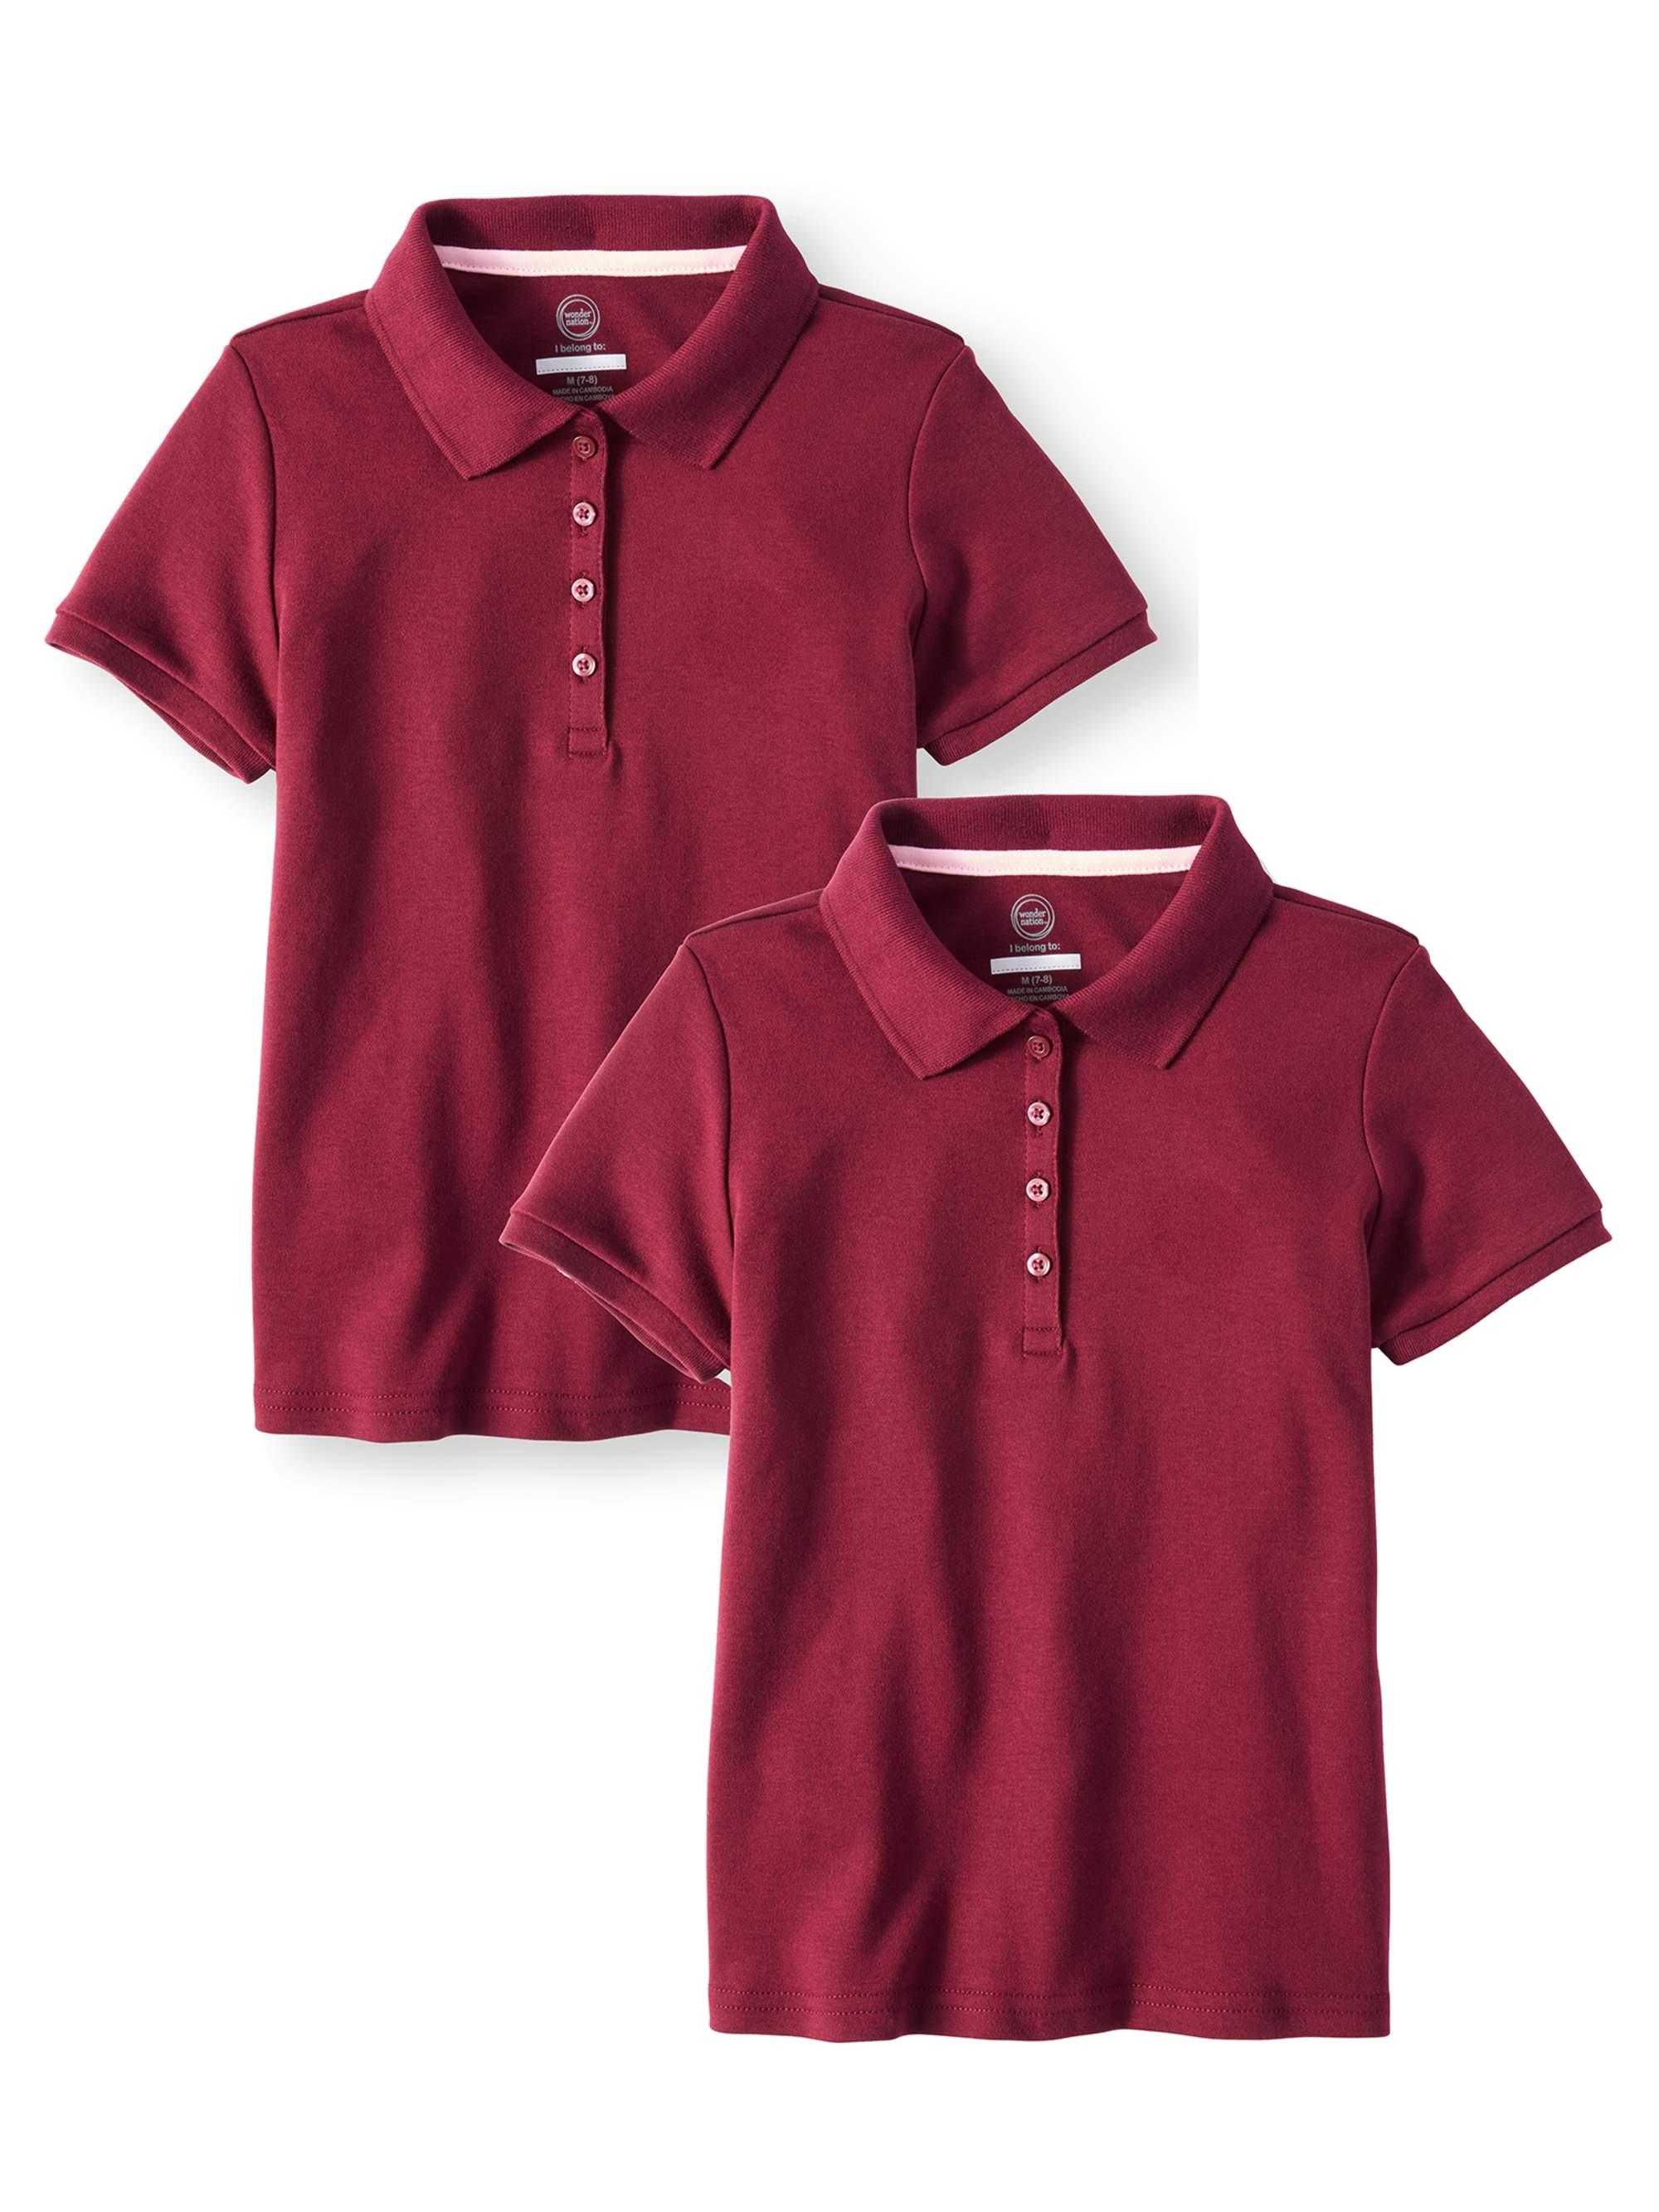 Girls School Uniform Short Sleeve Interlock Polo, 2-Pack Value Bundle